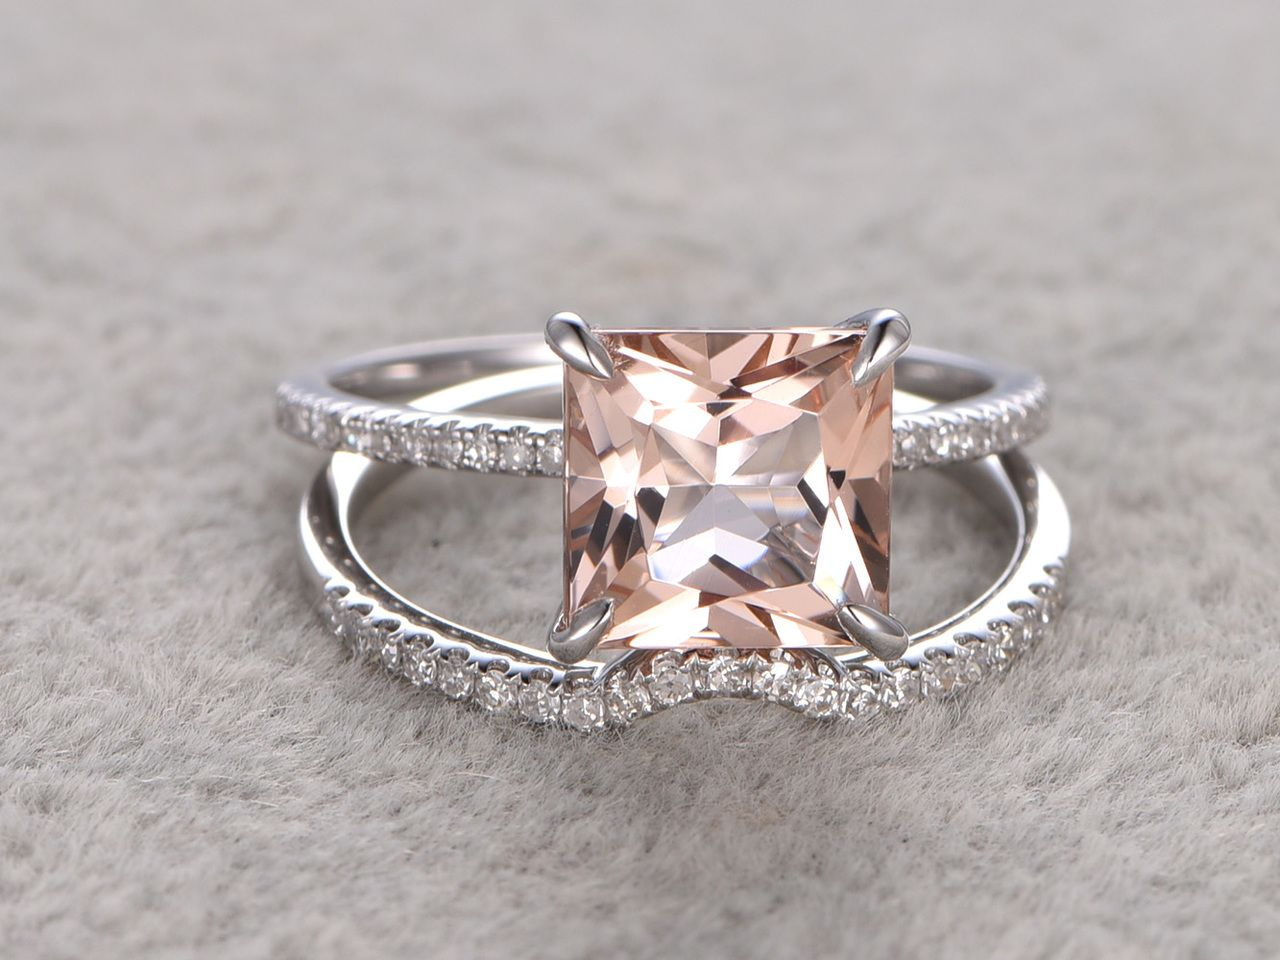 2 5 to 3 Carat Princess Cut Morganite Wedding Set Diamond Bridal